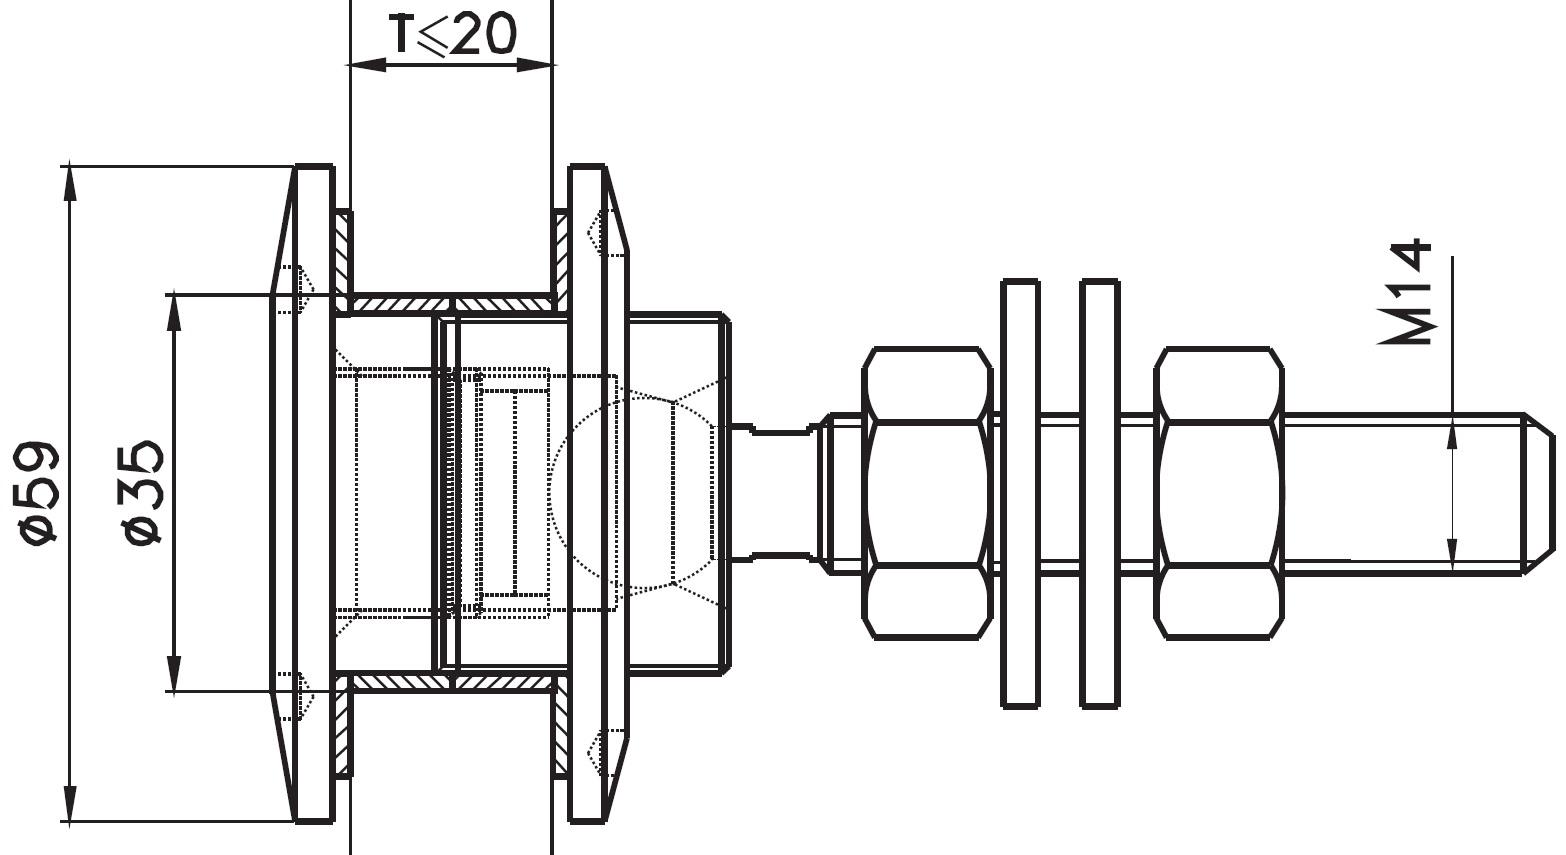 SPRO-60 / SPIDER ROTİL ÖNDEN SIKMALI Q60 Teknik Çizim